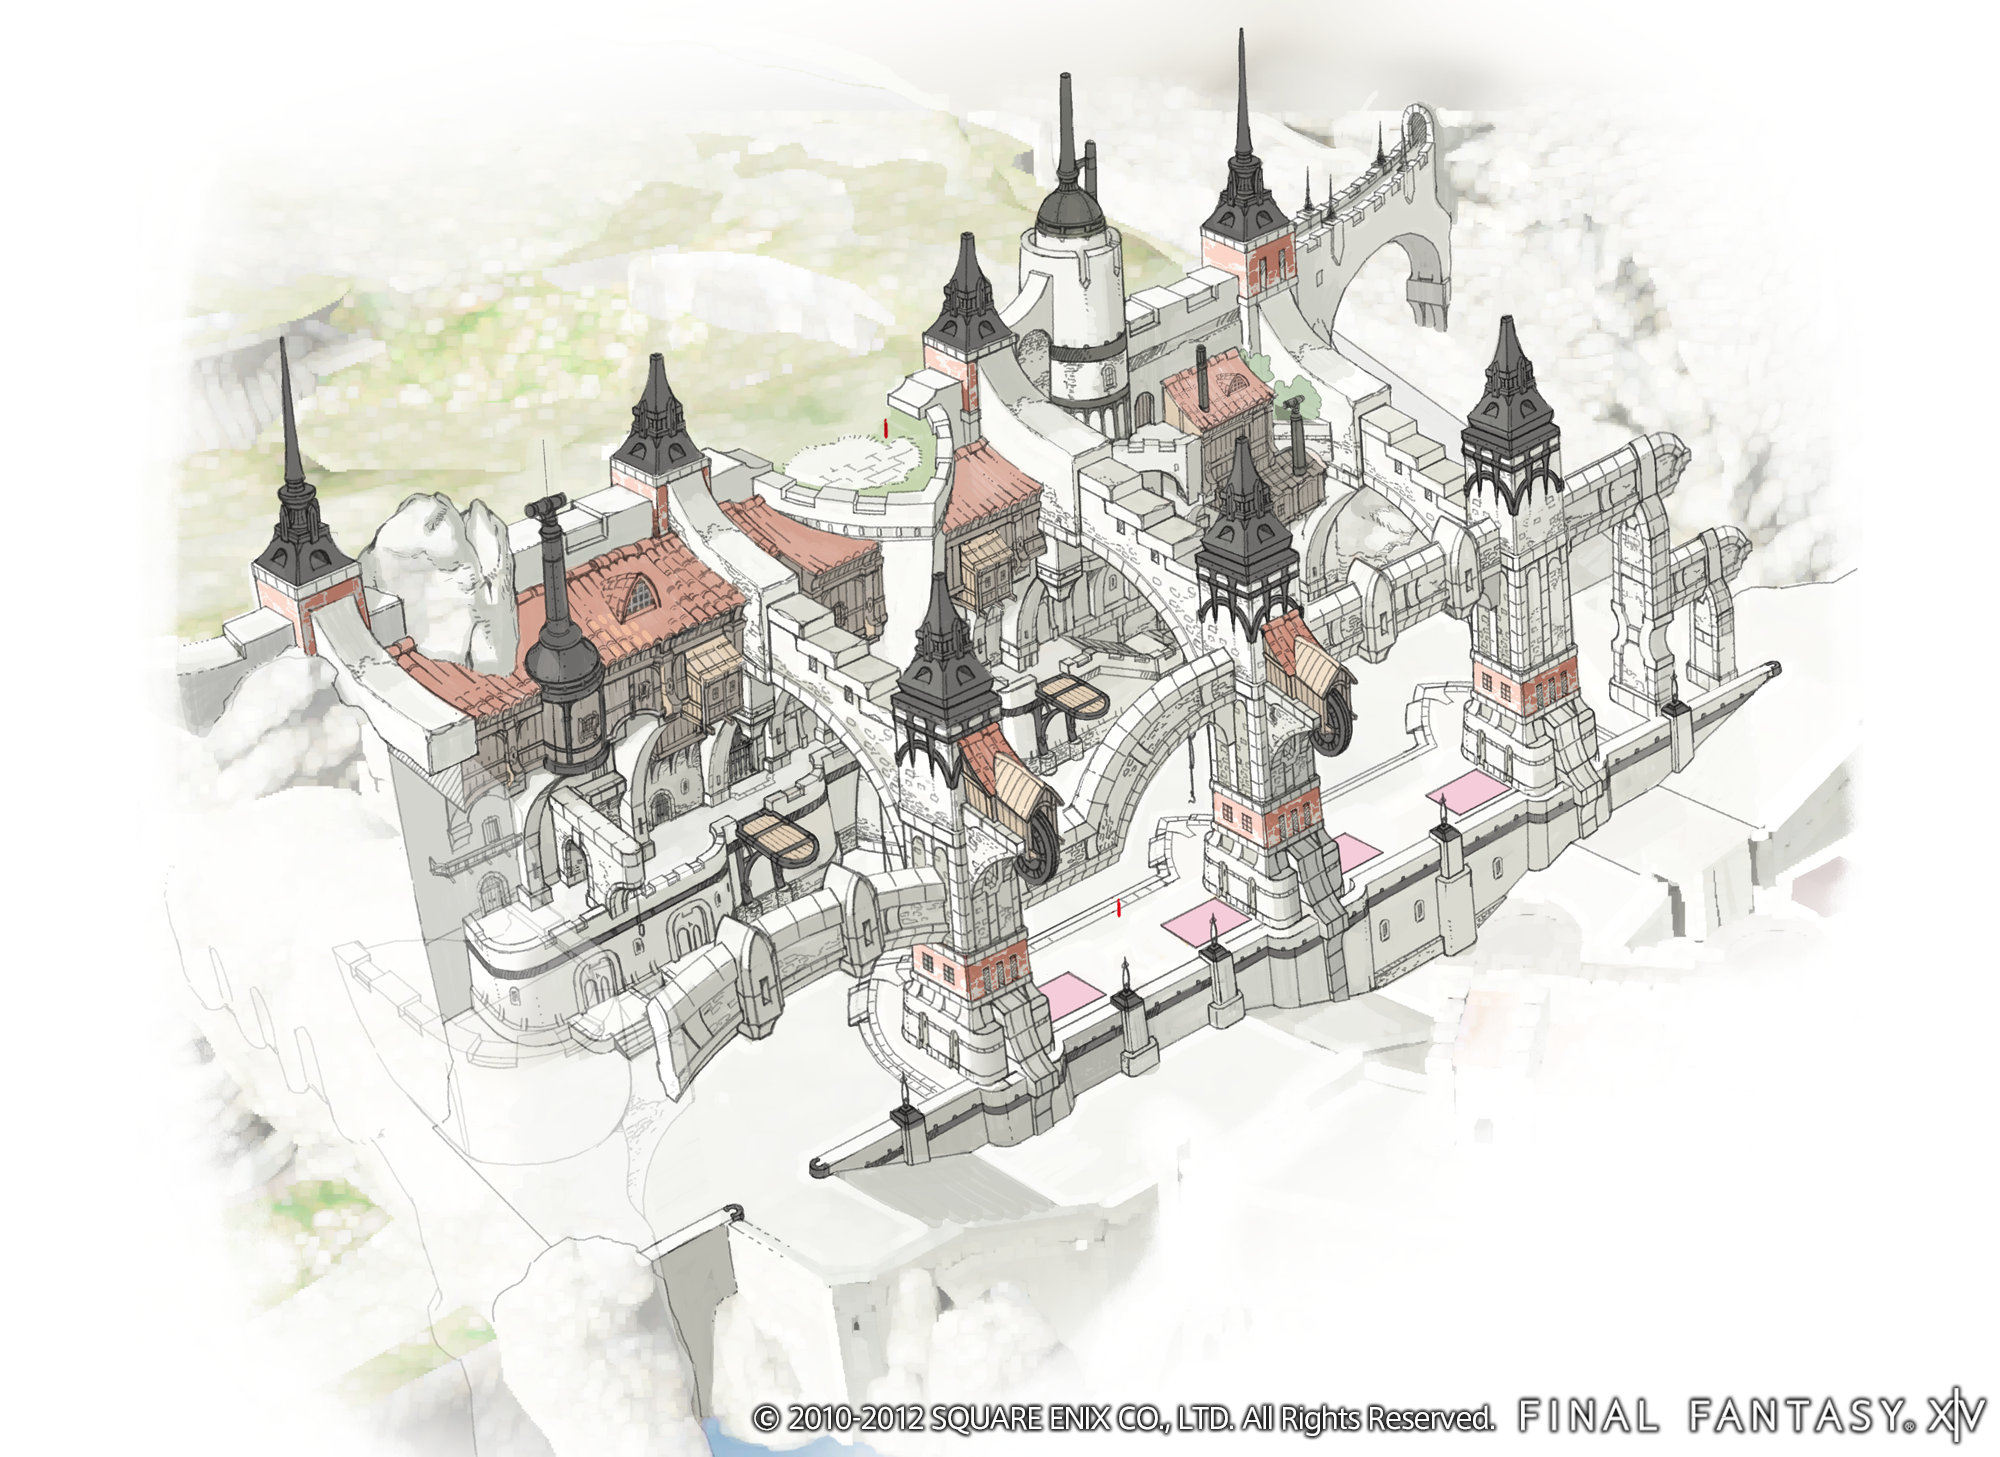 Final Fantasy Xiv A Realm Reborn Fantasy Art Wallpapers: Final Fantasy XIV: A Realm Reborn HD Wallpaper